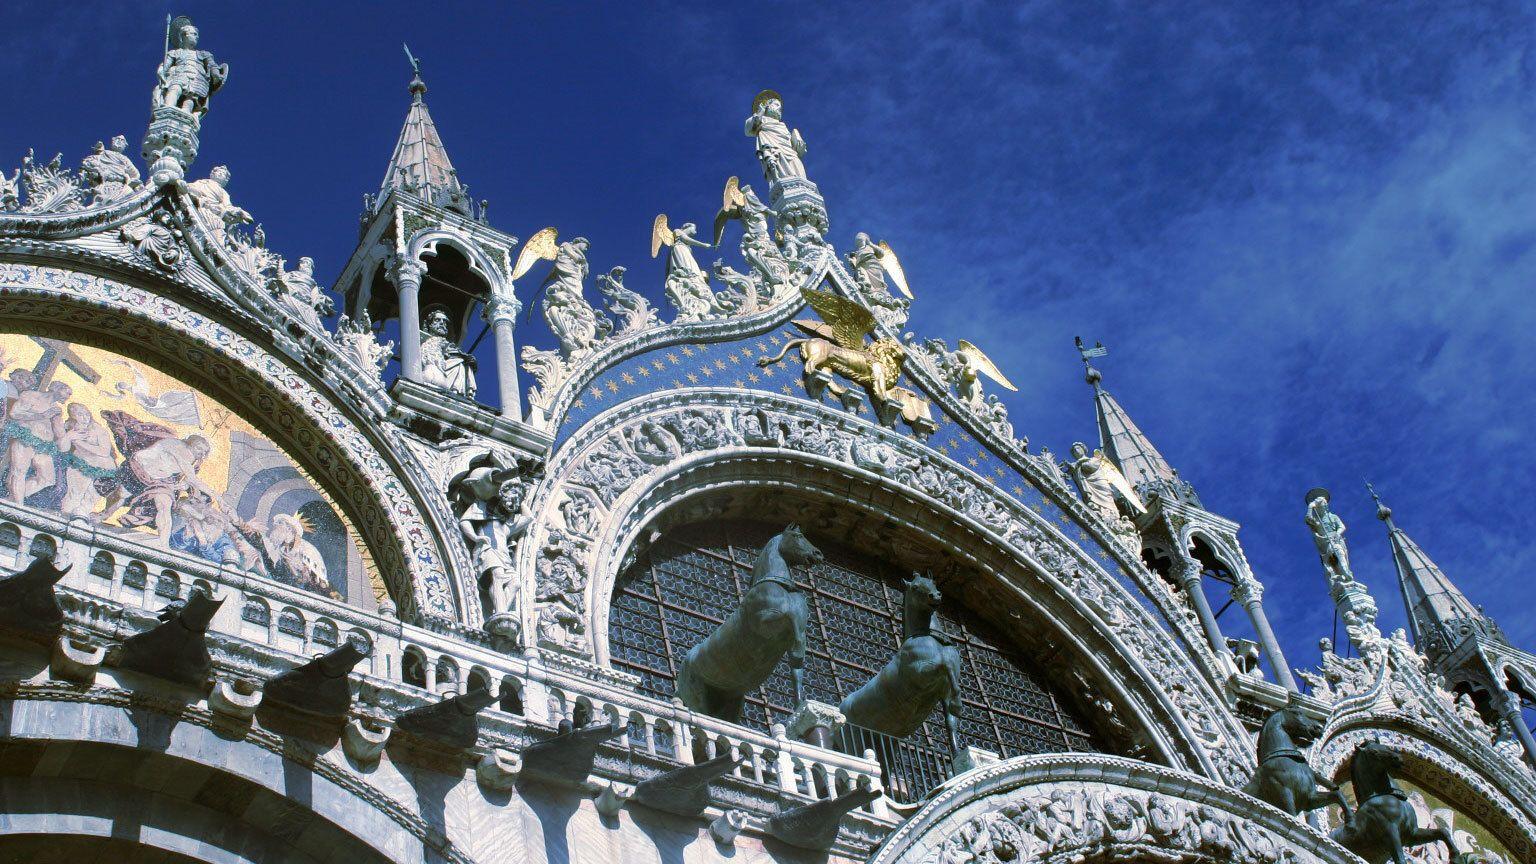 horse sculpture at the facade of Saint Mark's Basilica in Venice